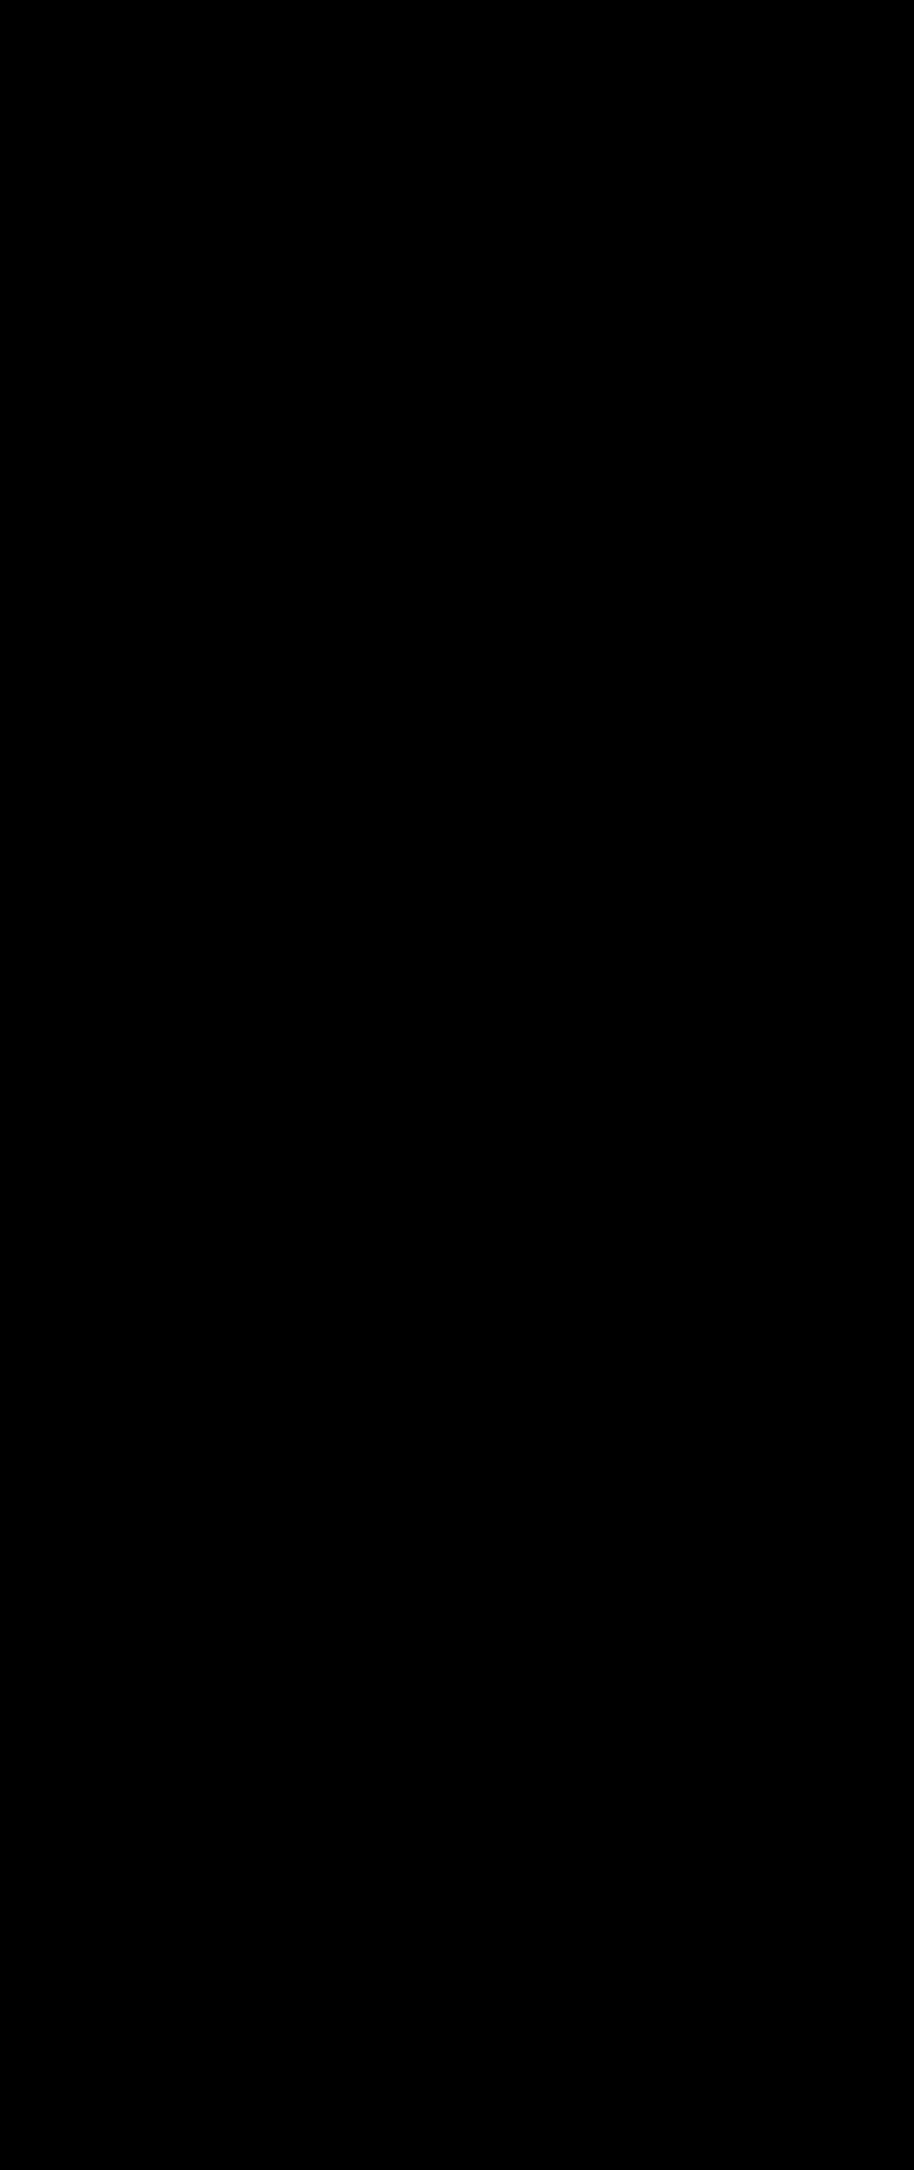 Free Walk Man Png With Transparent Background Free man png images, pac man world 2, mega man, mega man 10, mega man zx, healing the man blind from birth, man body, spider man cartoon. https www vecteezy com png 1196419 walk man